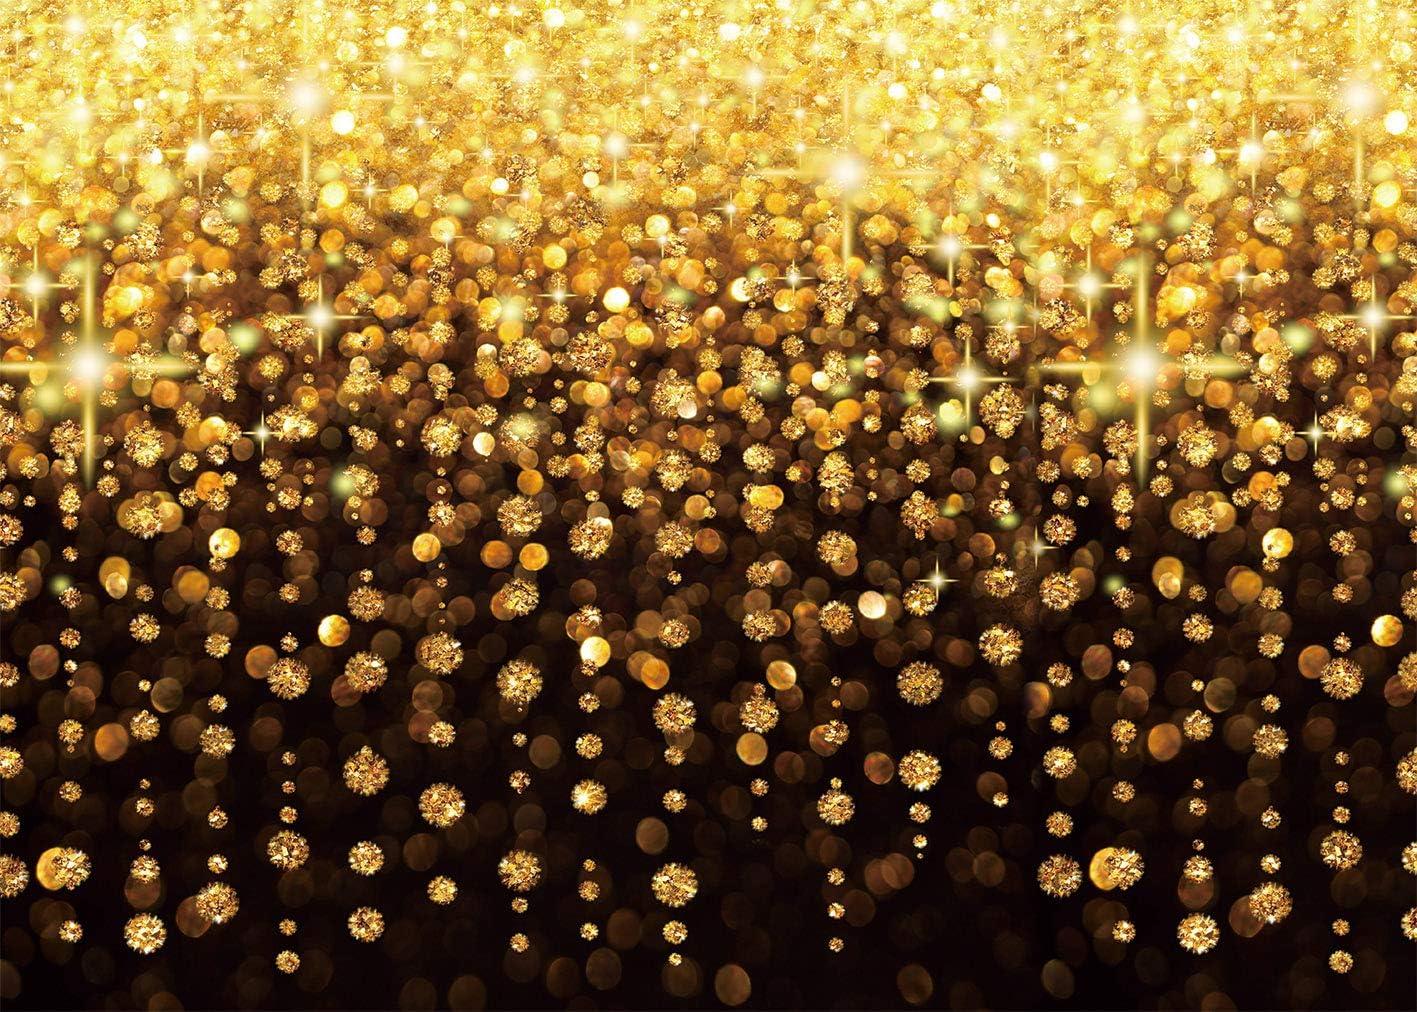 210cmx150cm 7x5FT DANIU Golden Bokeh Glitter Sequin Spots Photography Backdrop Selfie Portrait brown Background 7x5ft Birthday Wedding Baby Shower Party Banner Decor Photo Booth Props